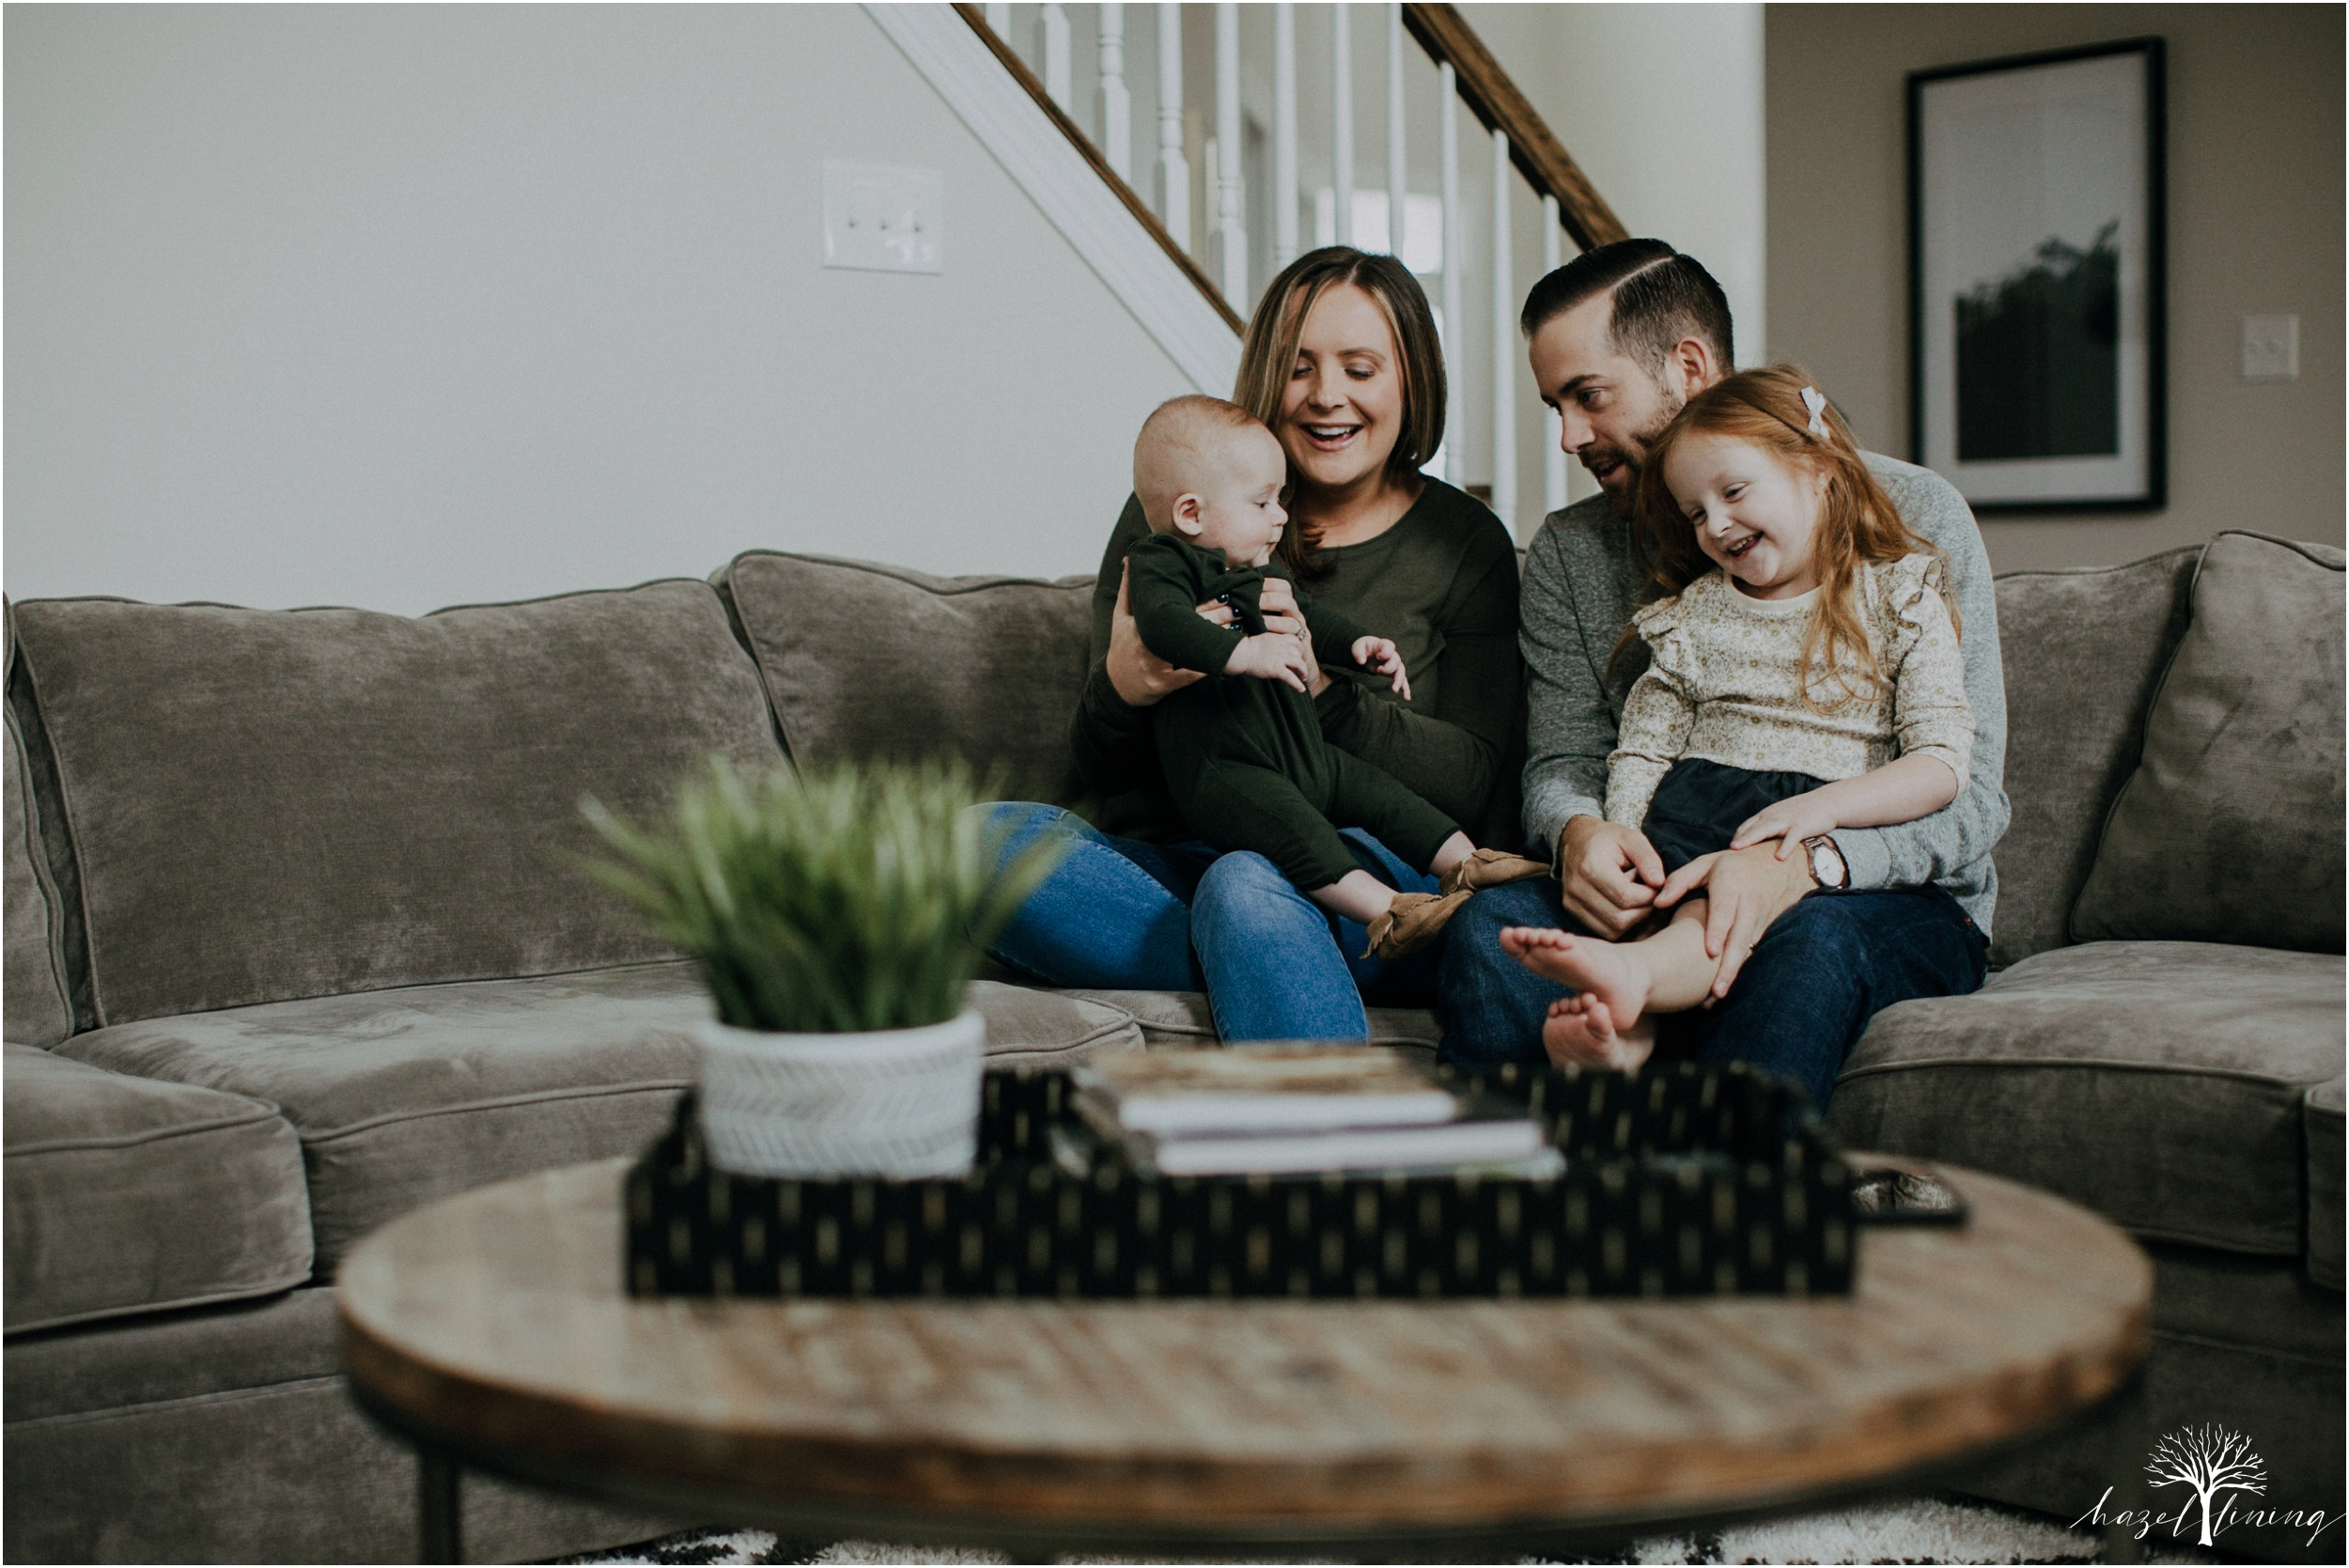 pellgrino-family-in-home-lifestyle-family-portraits_0036.jpg